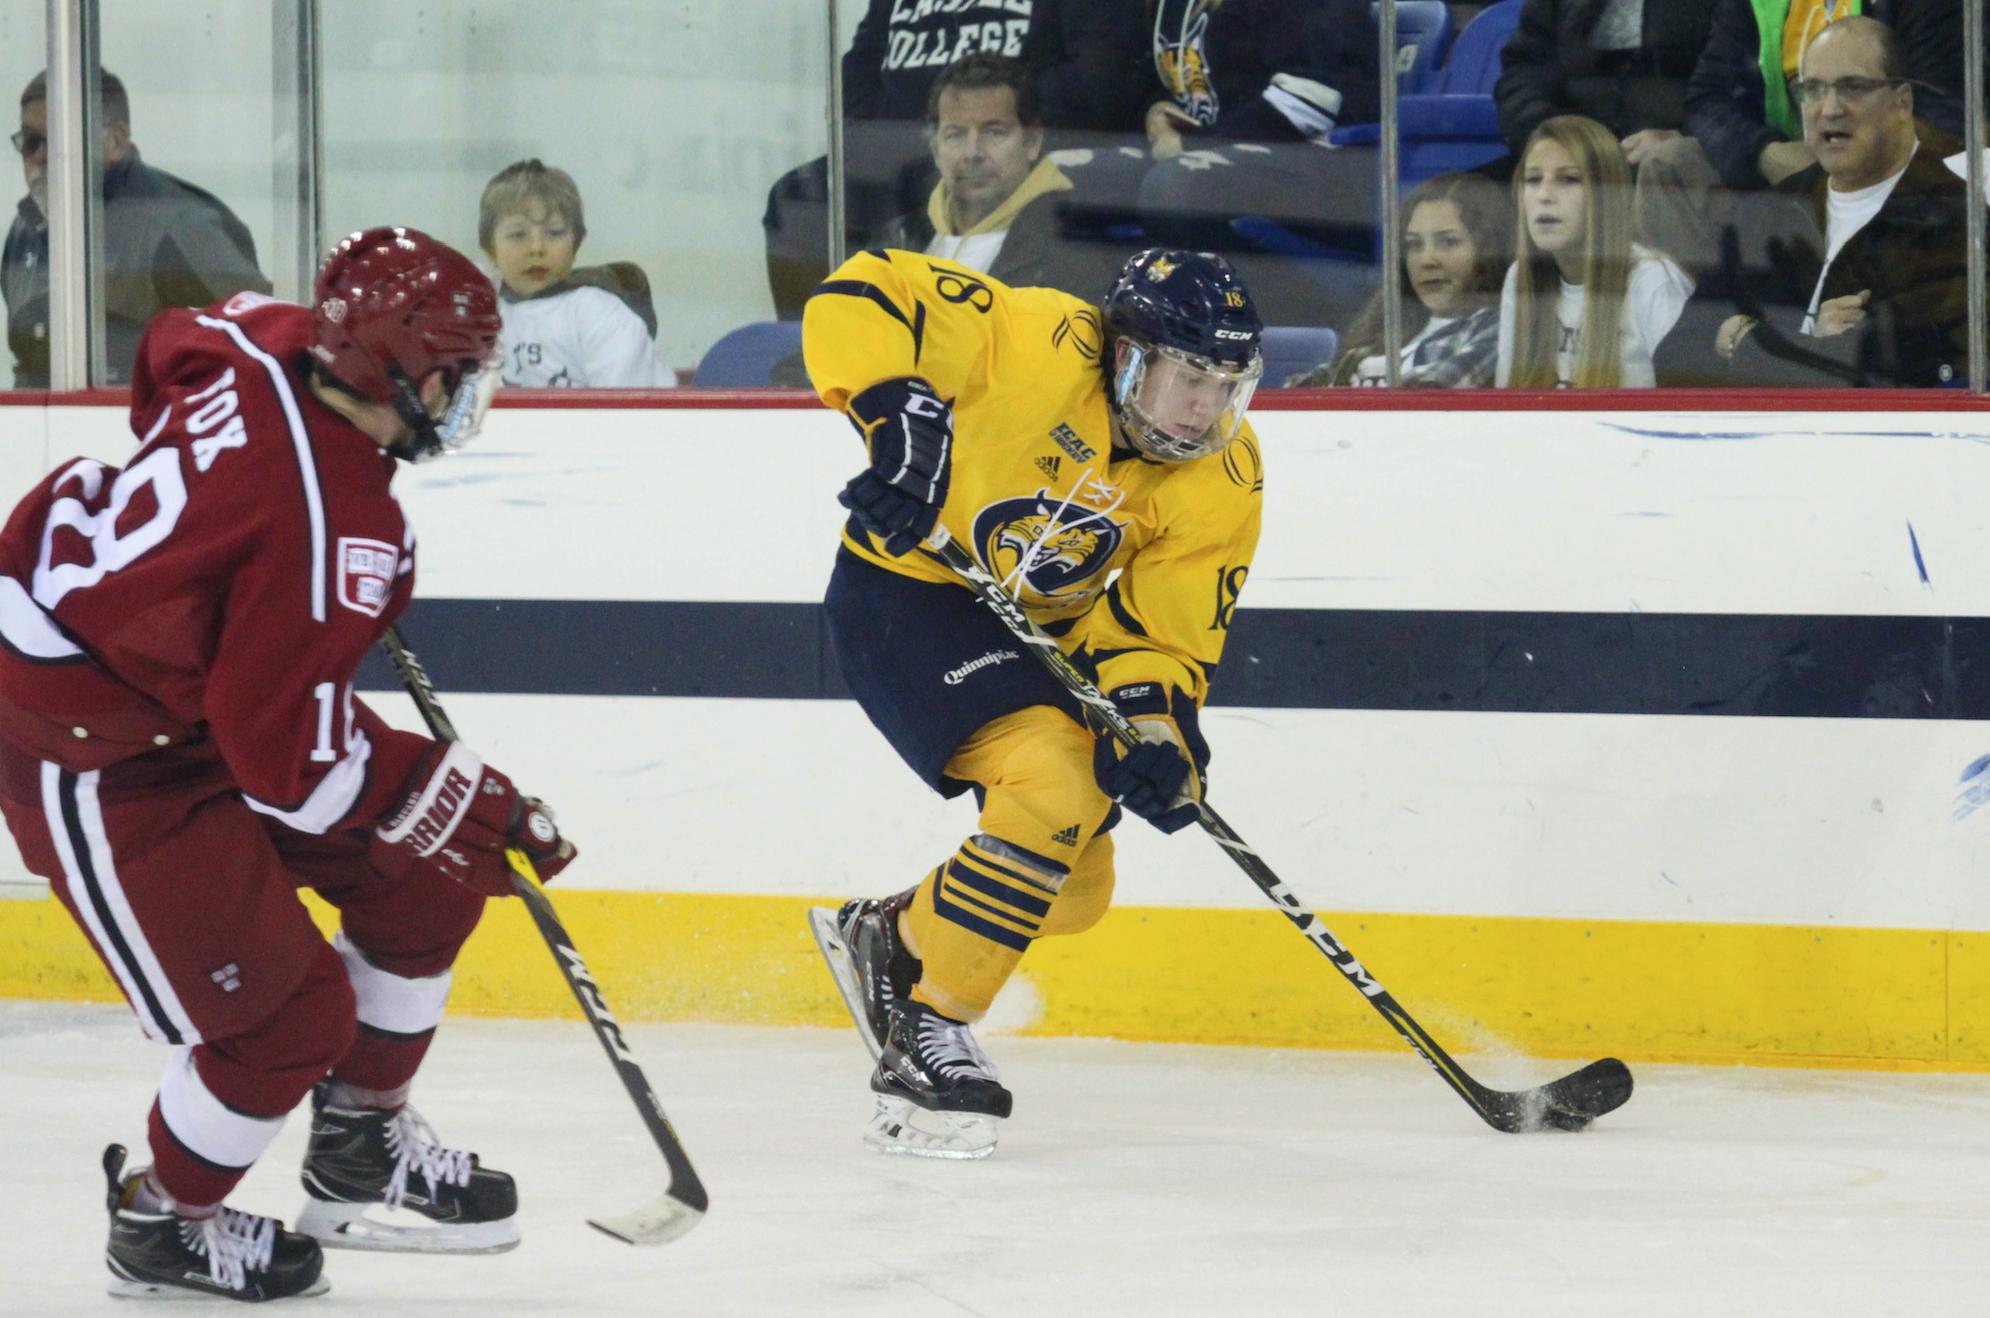 Quinnipiac men's ice hockey falls to Harvard